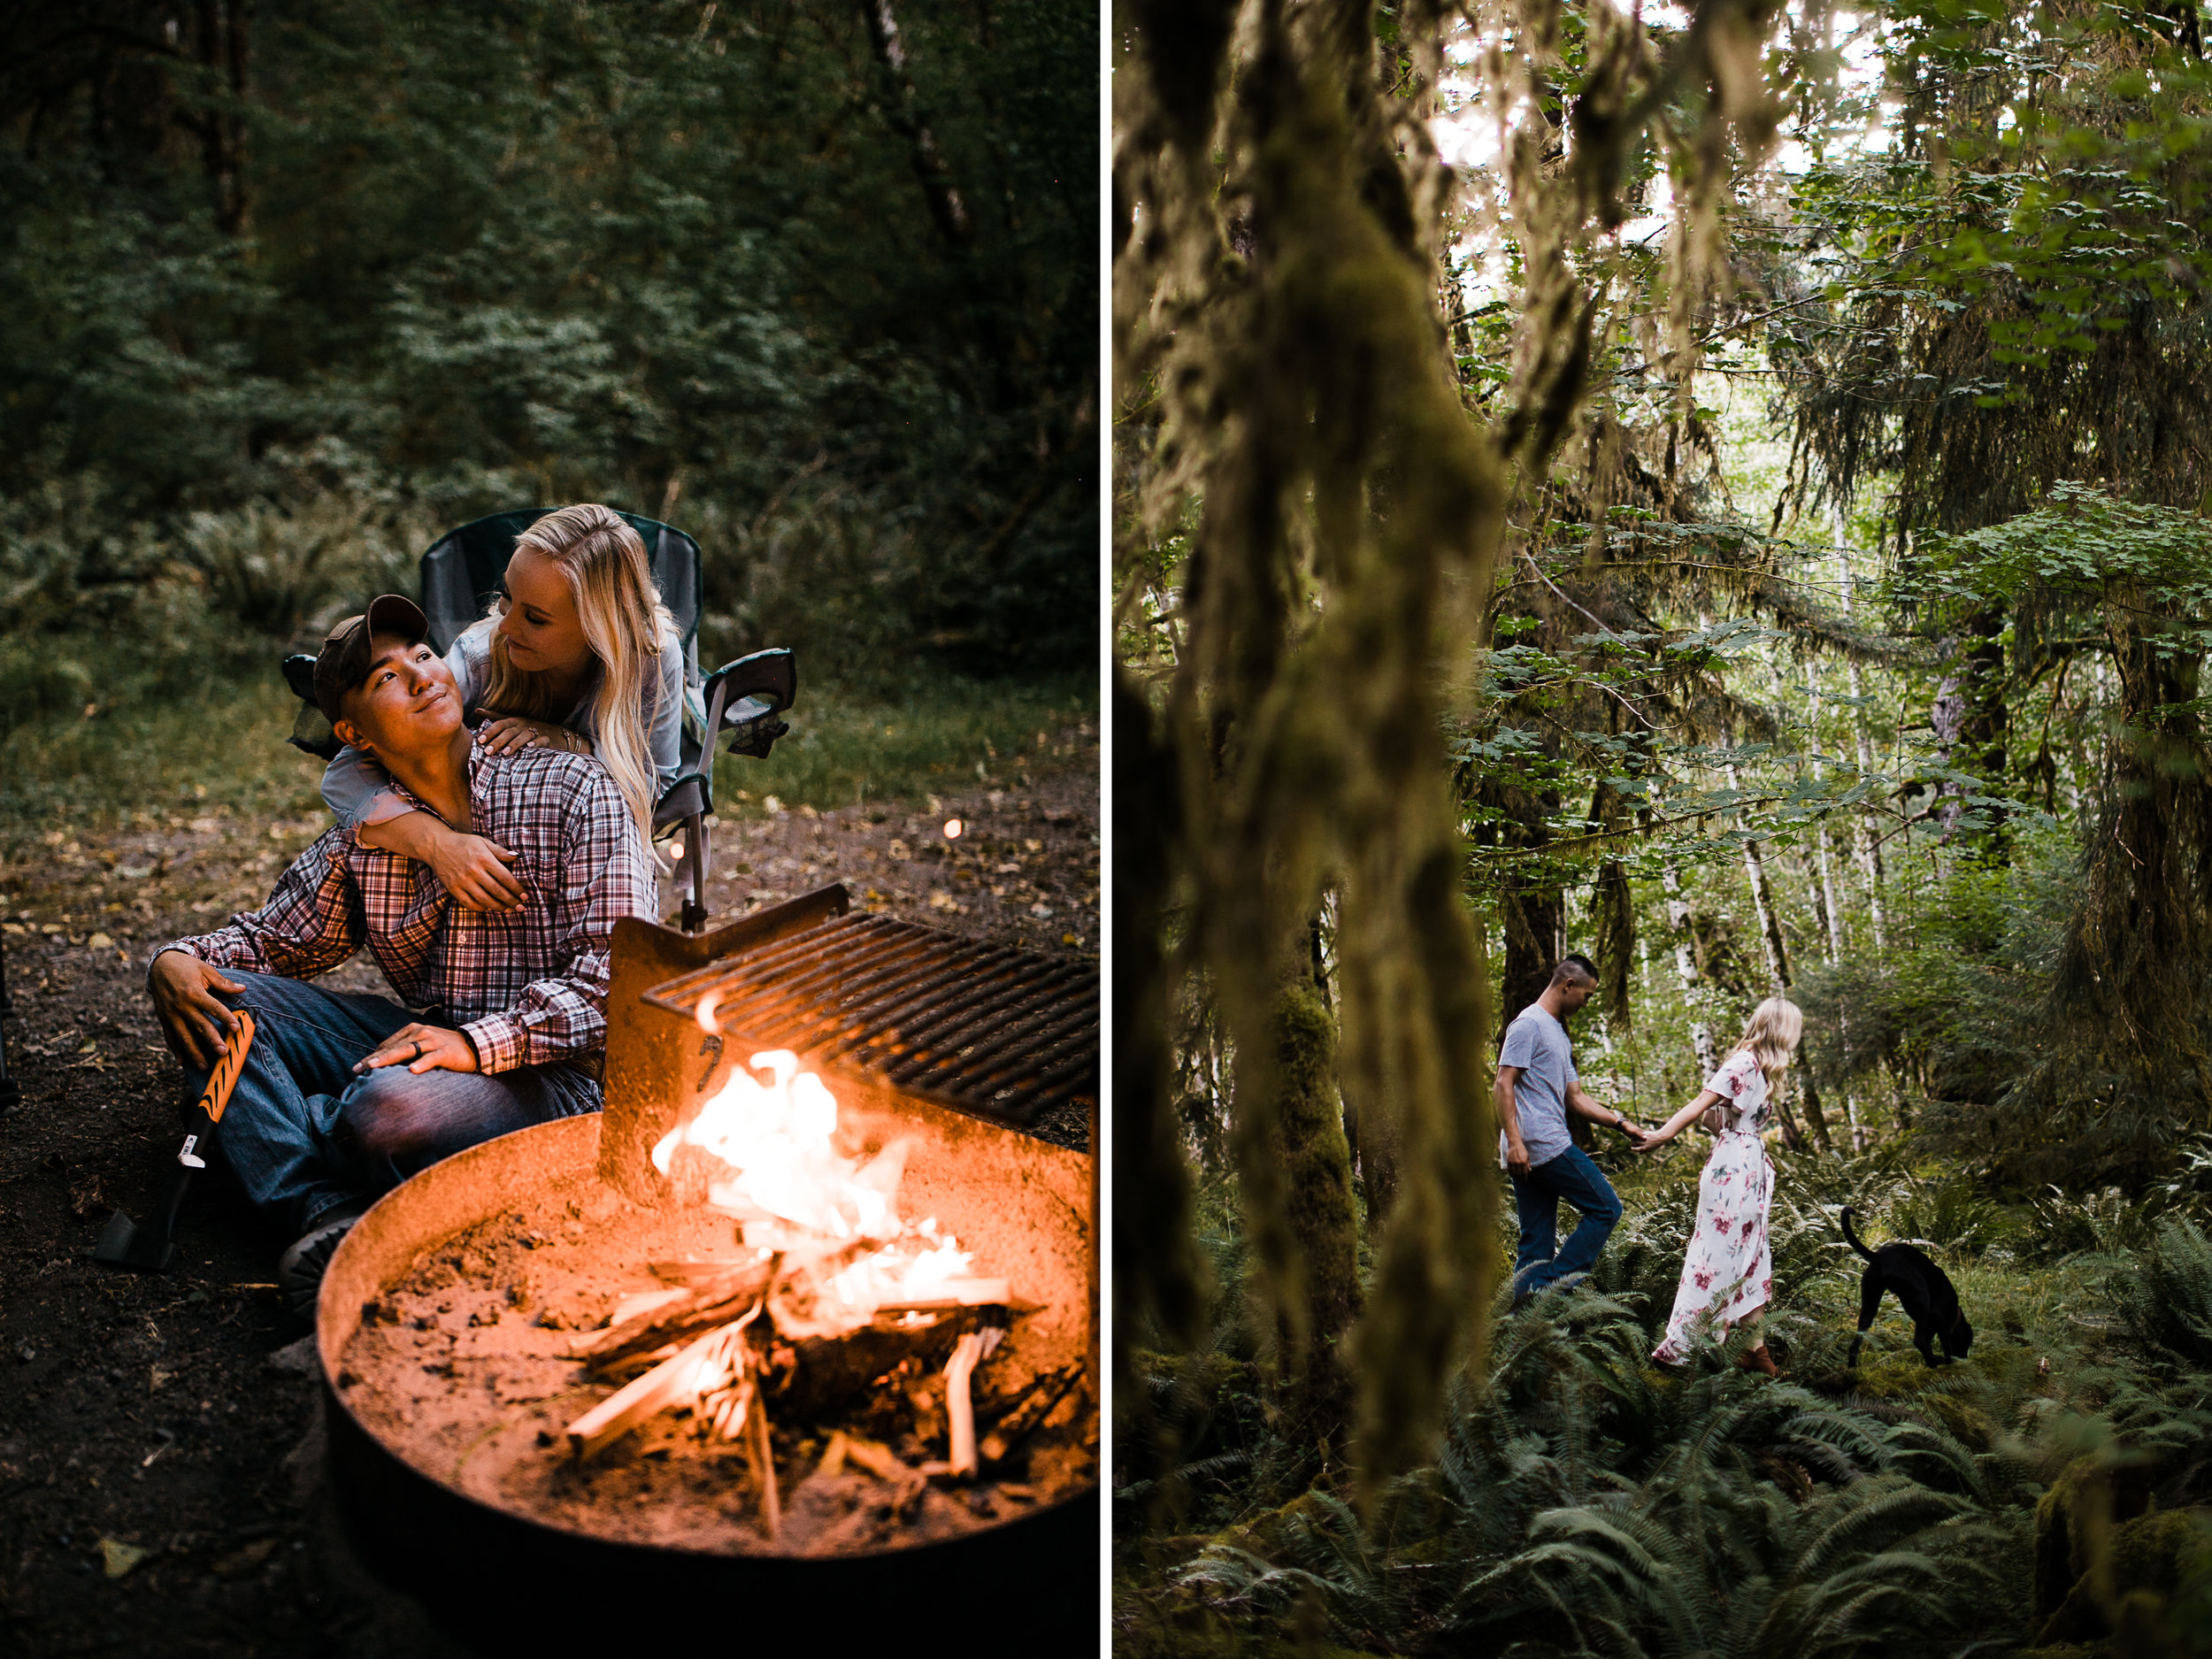 adventure engagement session in olympic national park | destination engagement photo inspiration | utah adventure elopement photographers | the hearnes adventure photography | www.thehearnes.com